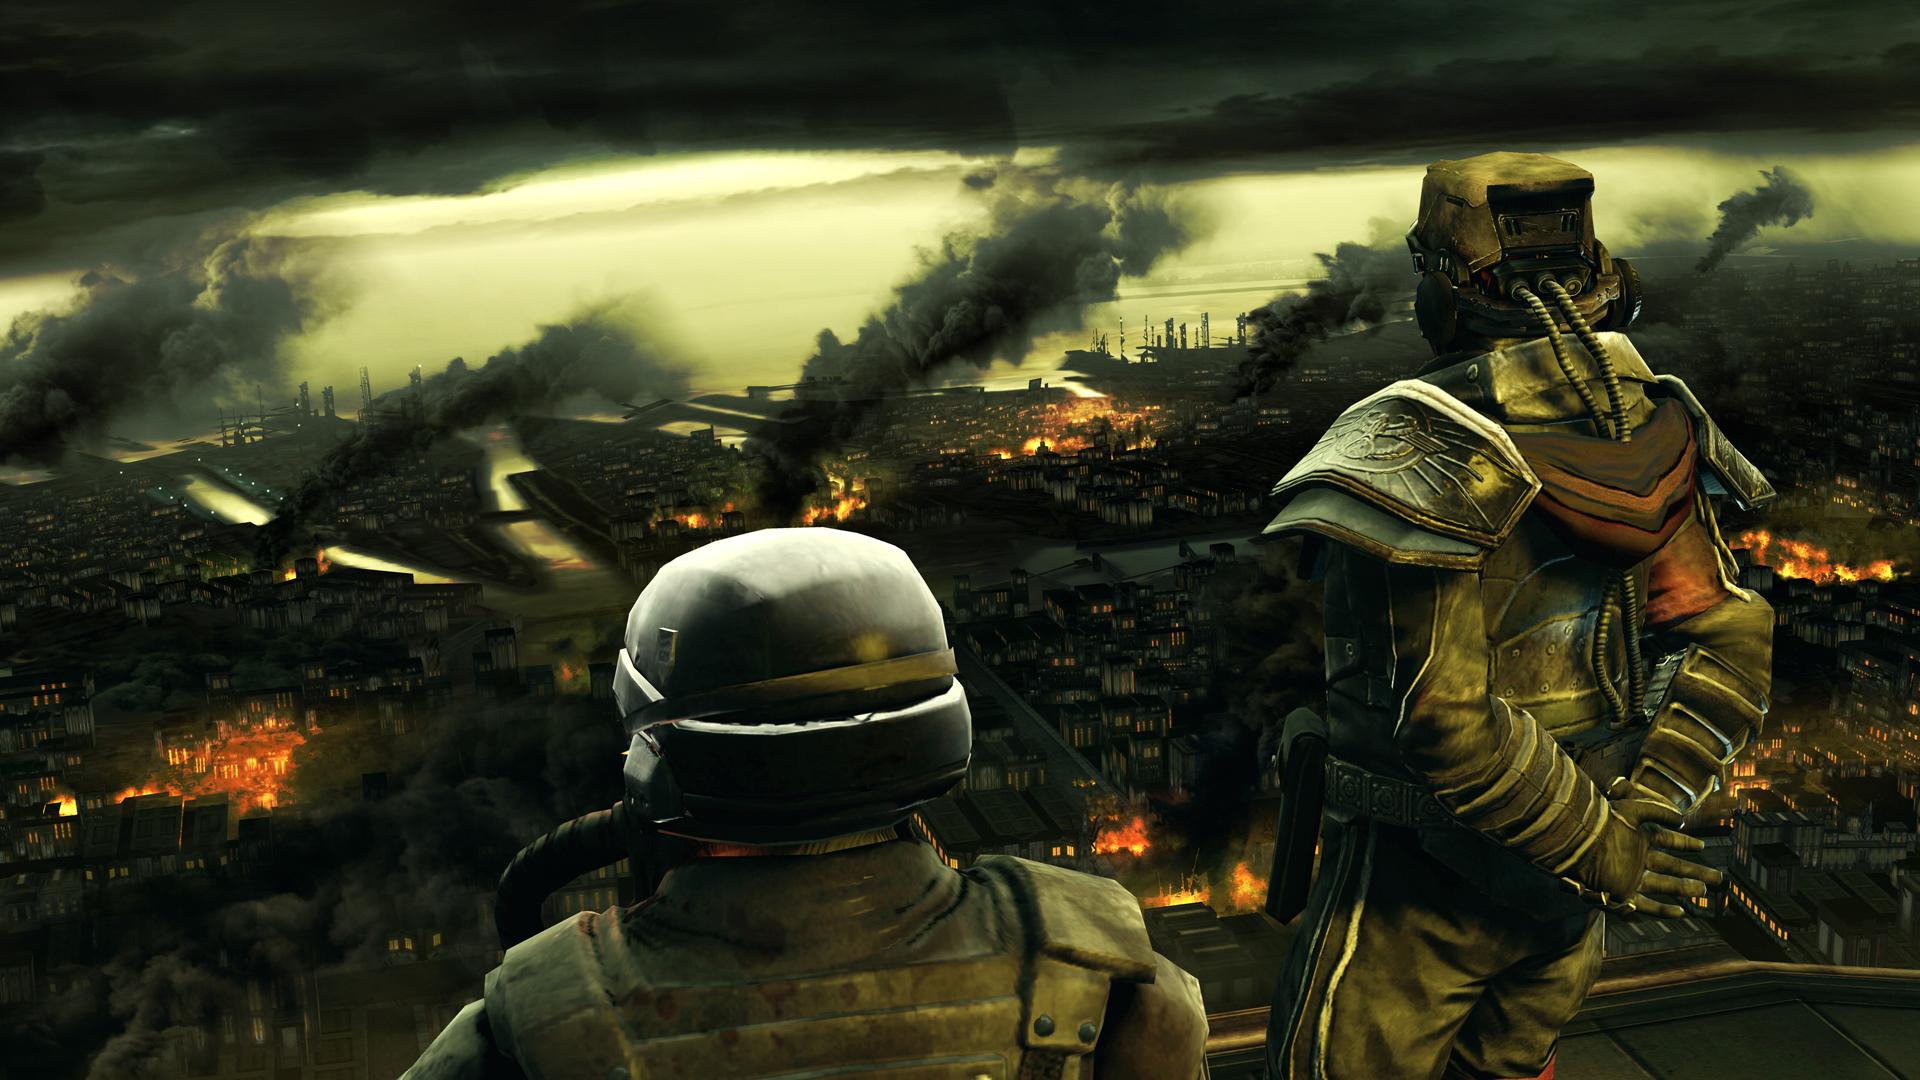 Killzone Destruction - Killzone Destruction